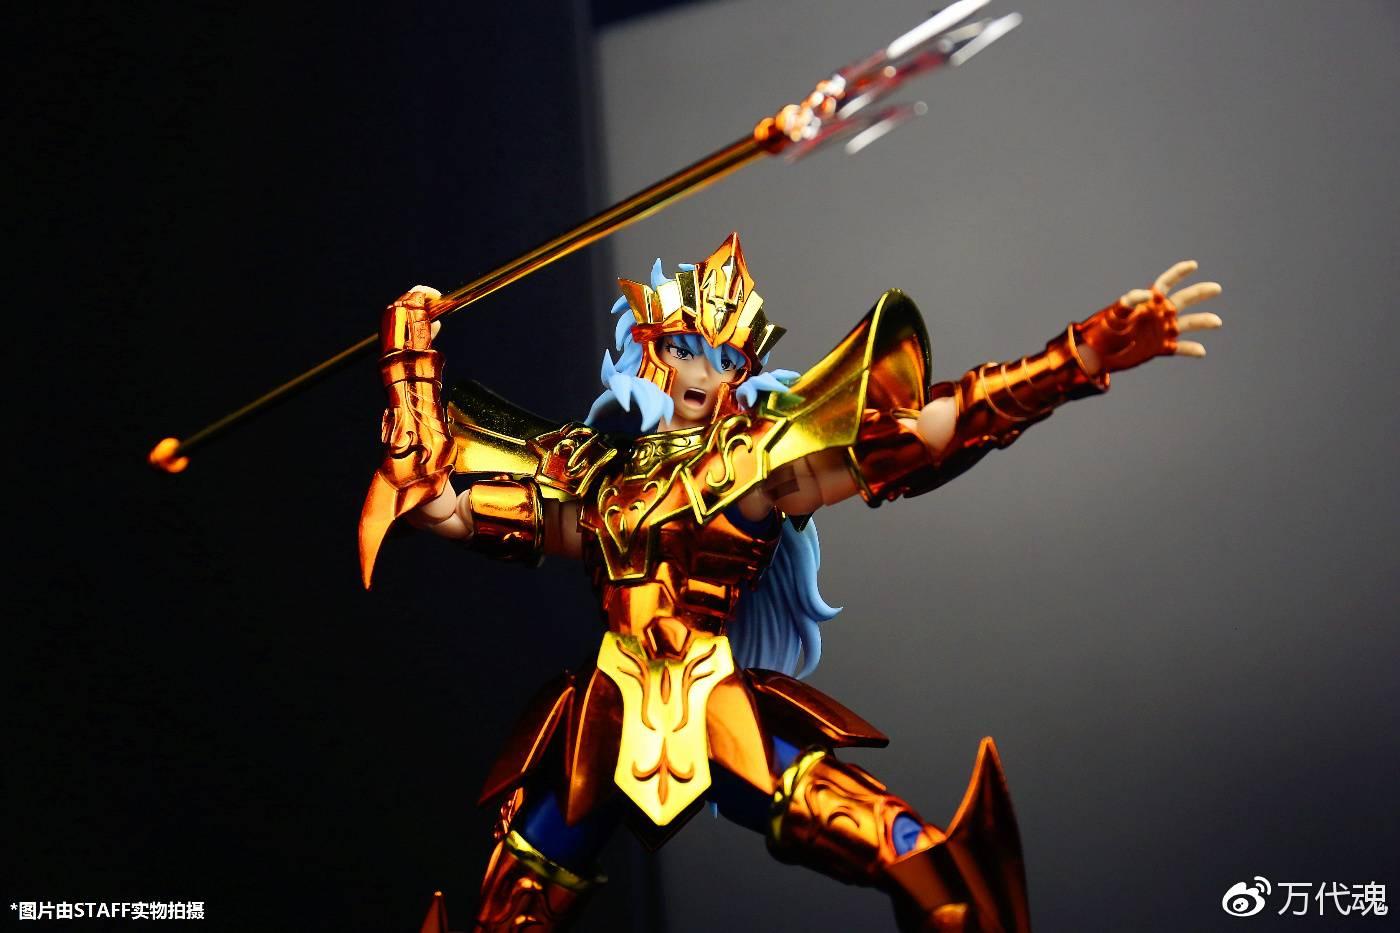 [Imagens] Poseidon EX & Poseidon EX Imperial Throne Set MR6StAZC_o